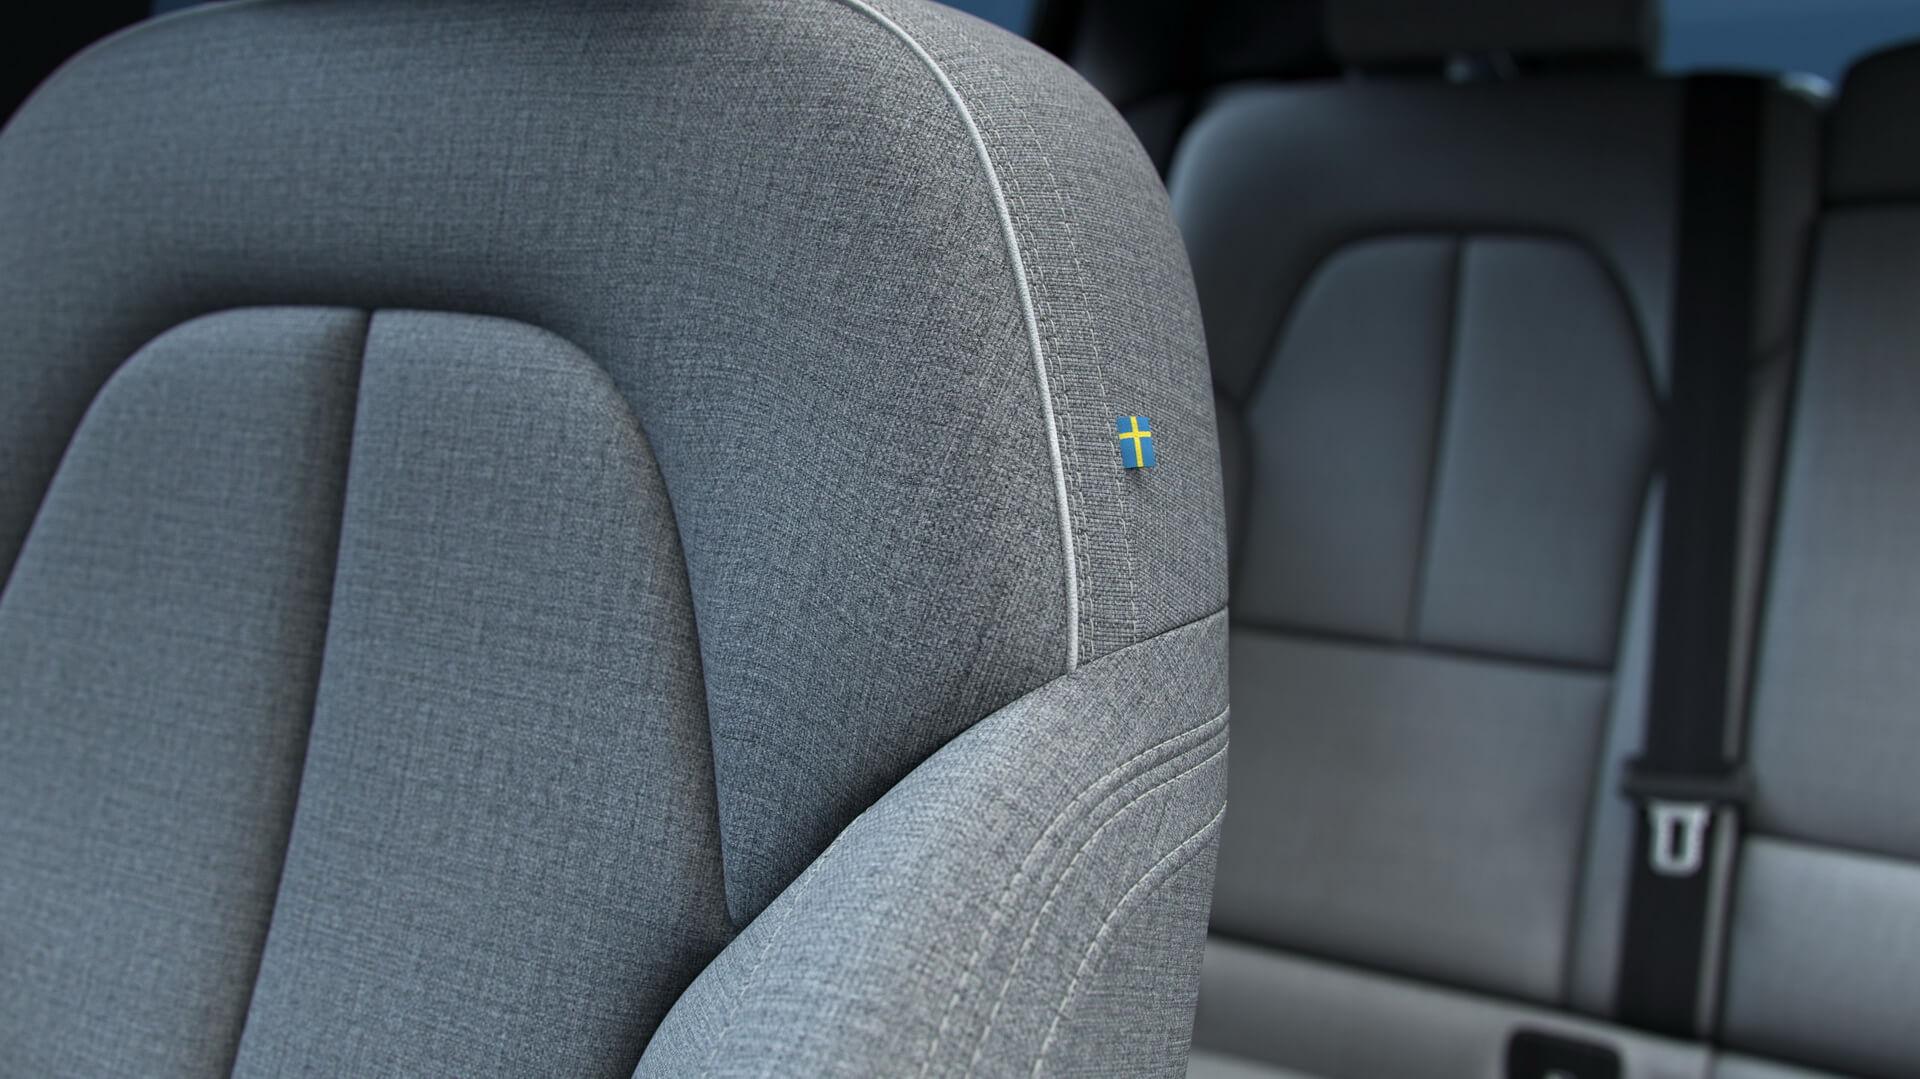 Шерстяная текстильная обивка салона Volvo C40 Recharge